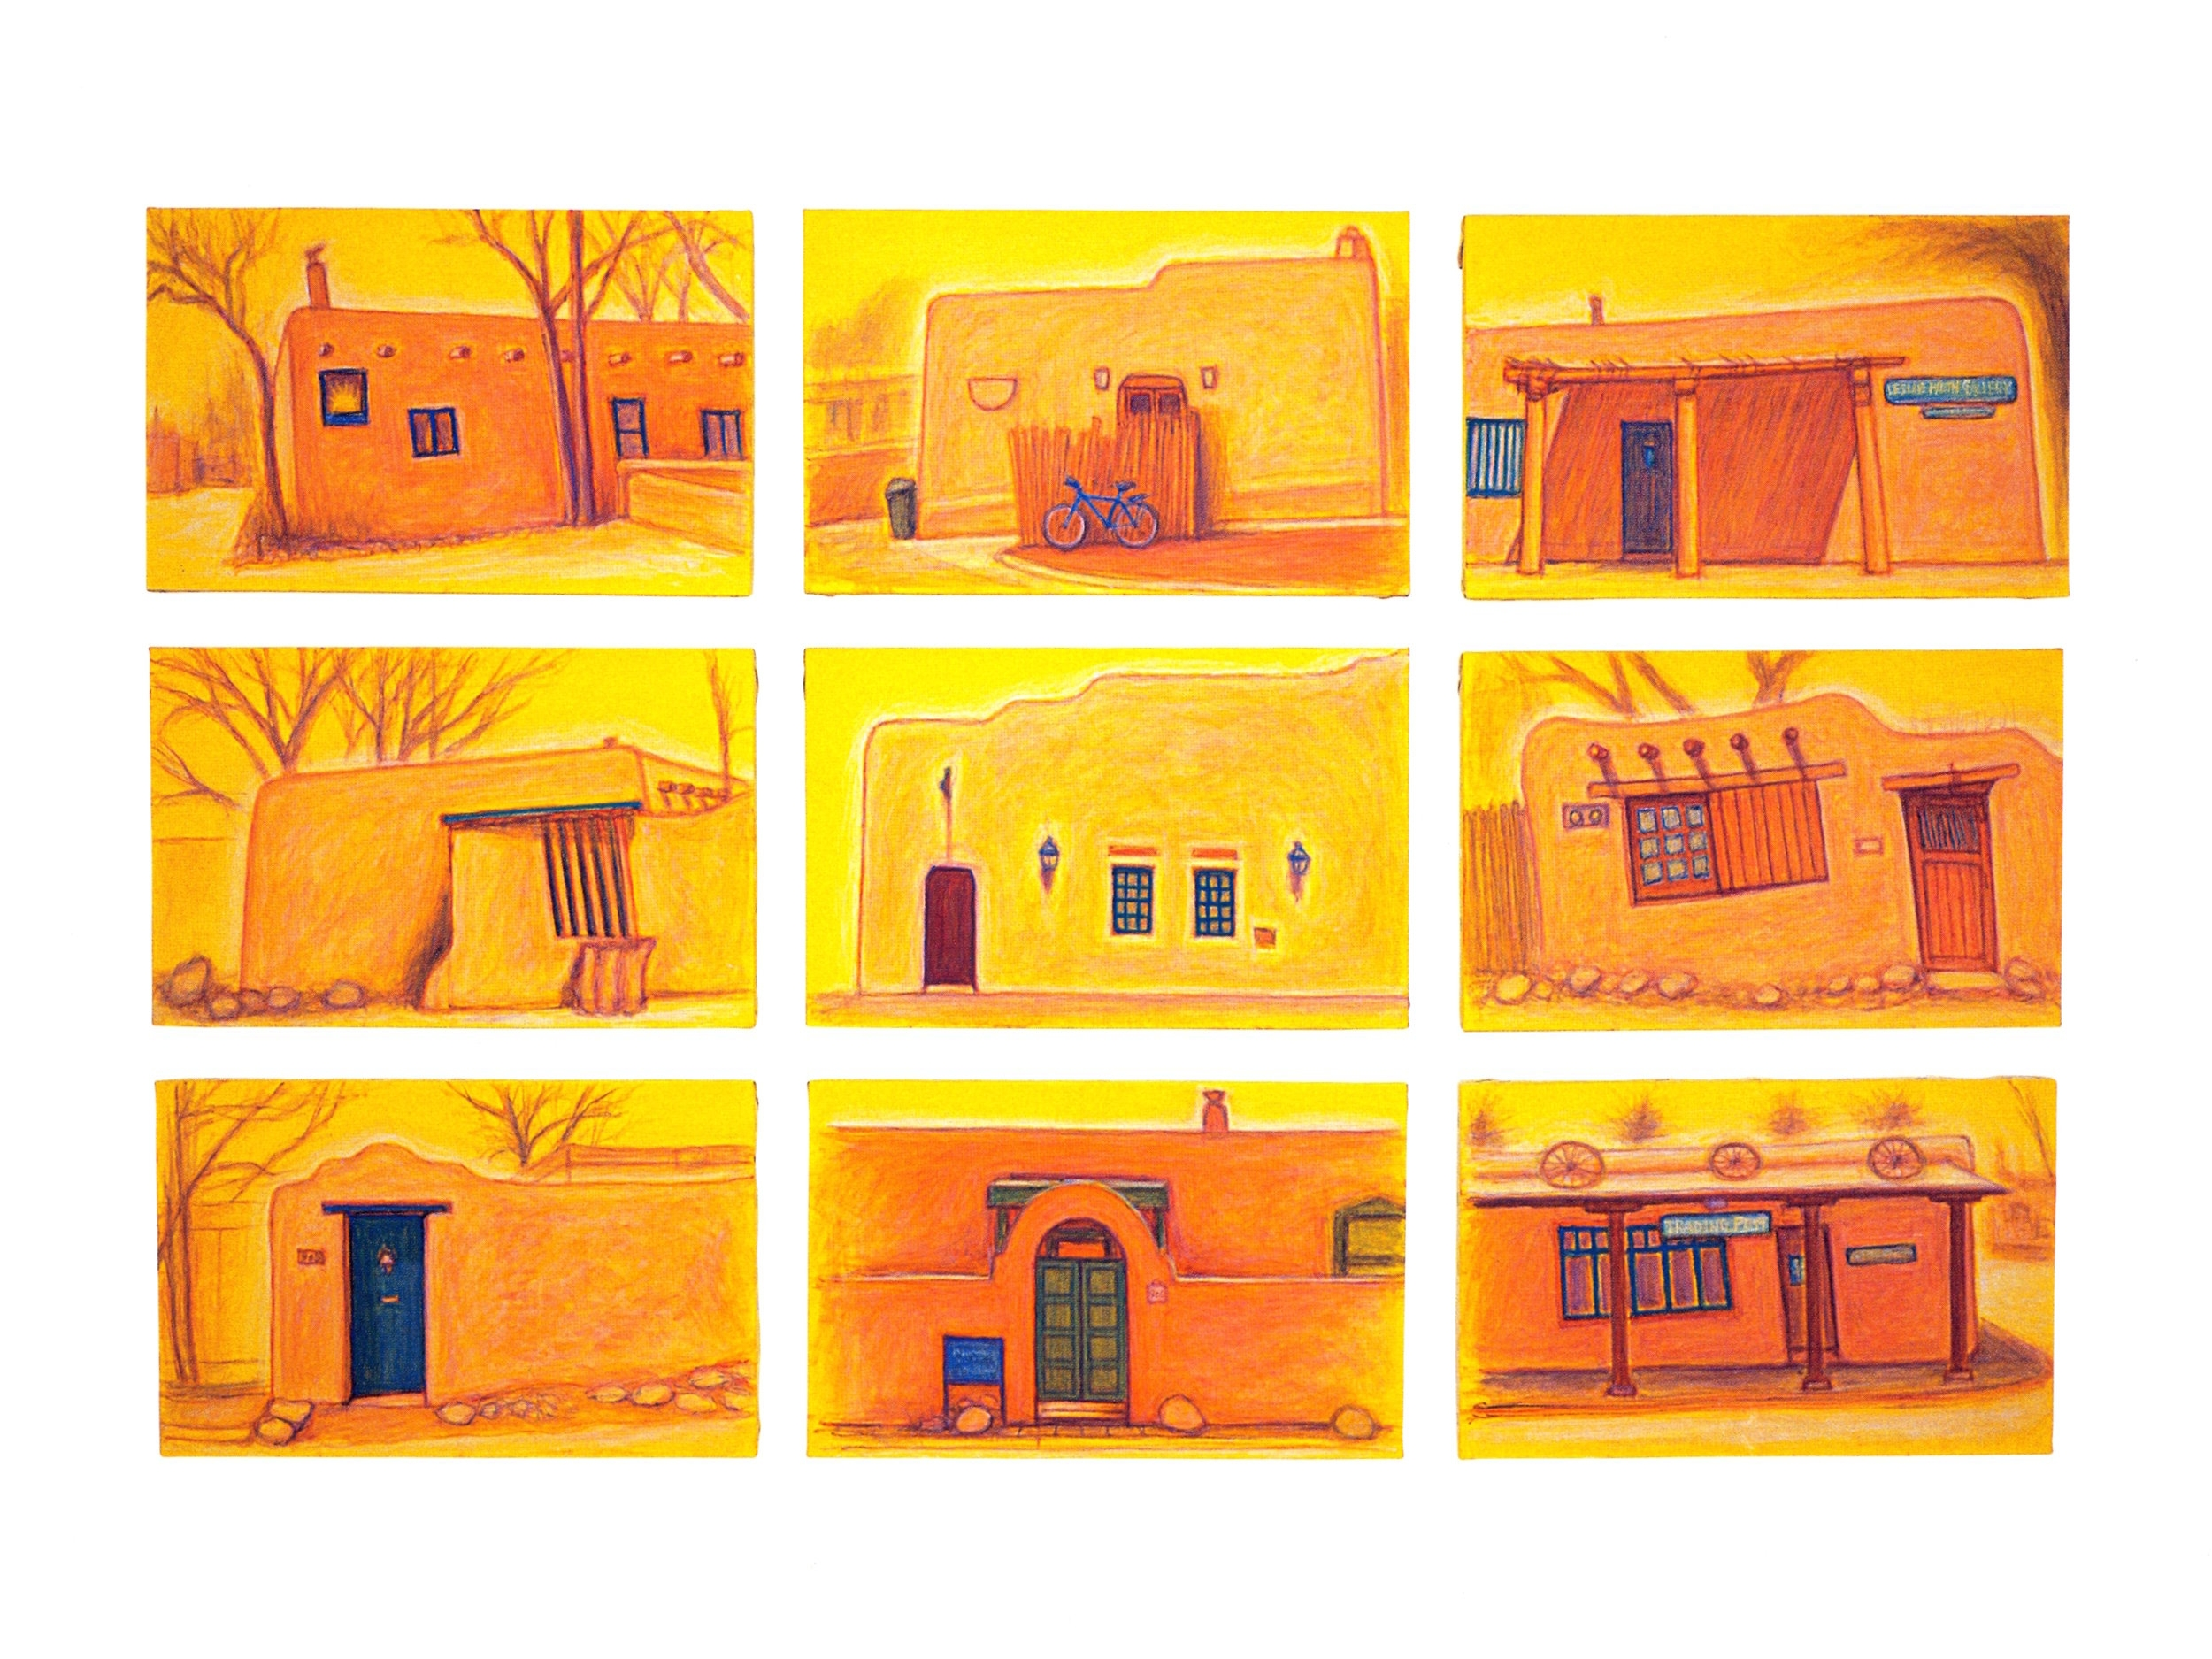 Adobe, Santa Fe - 1   Oil on canvas, 43'' x 66'', 2004